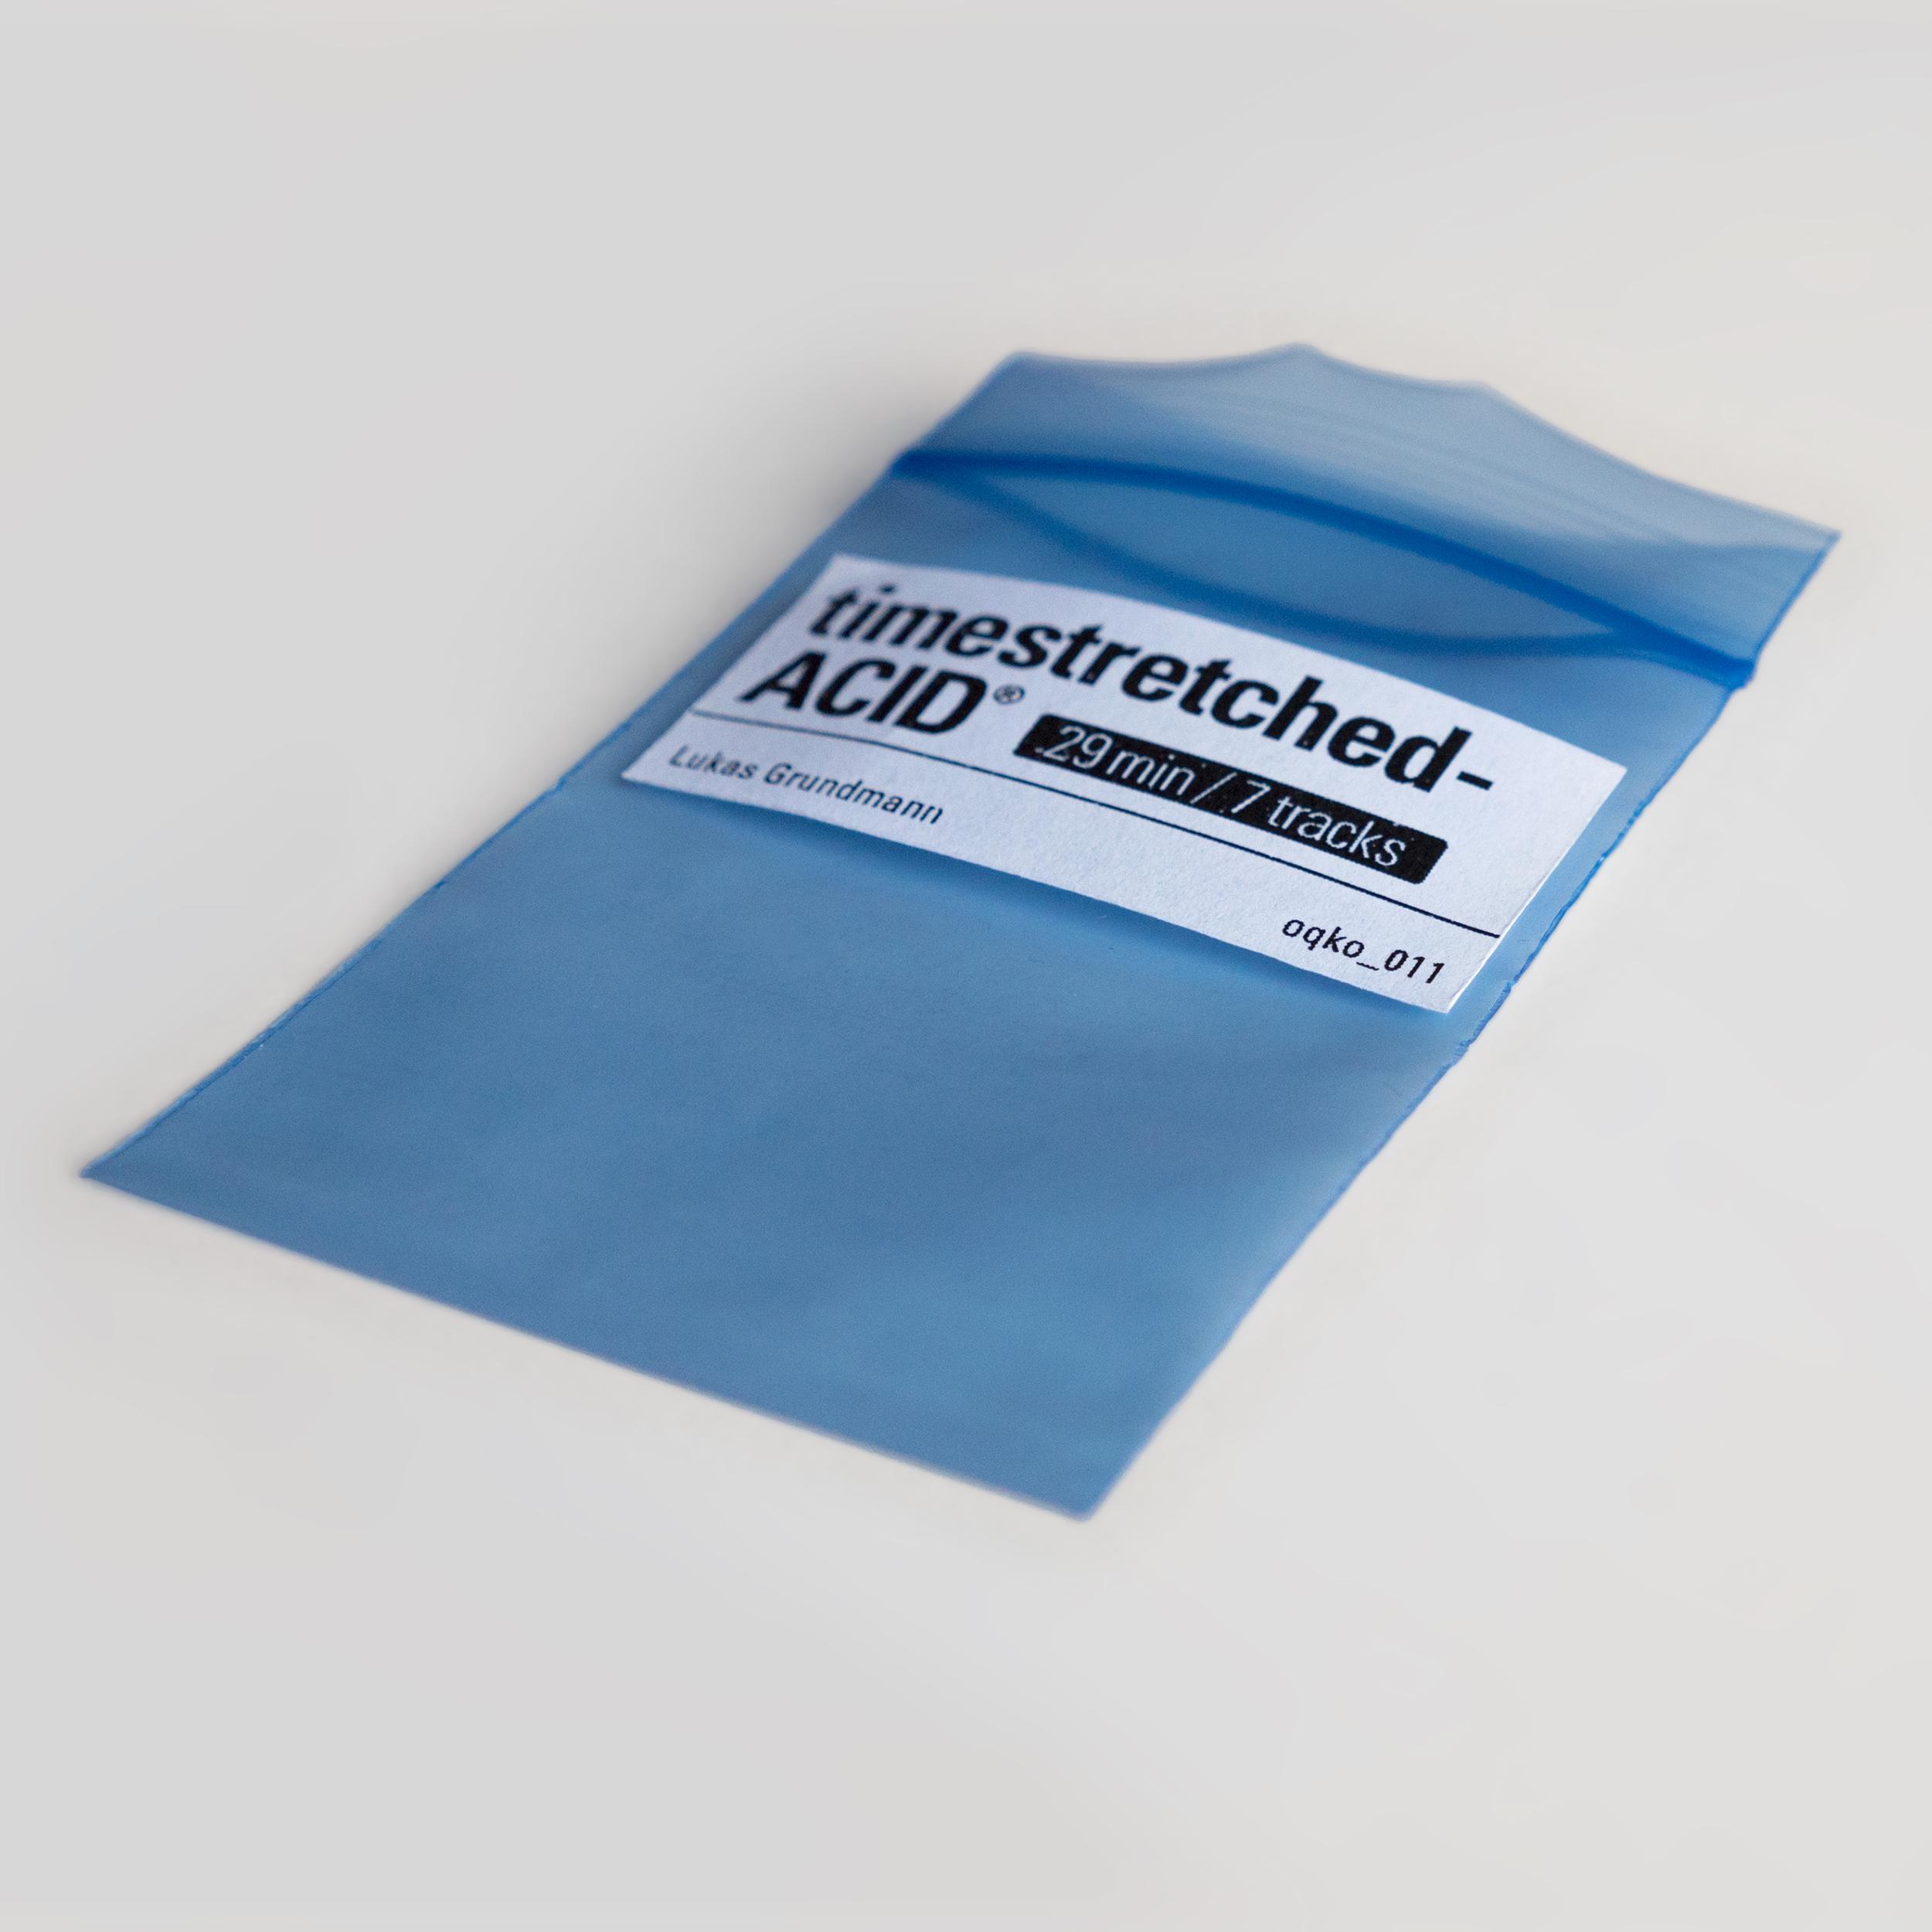 Lukas Grundmann - timestretched-ACID   oqko_011